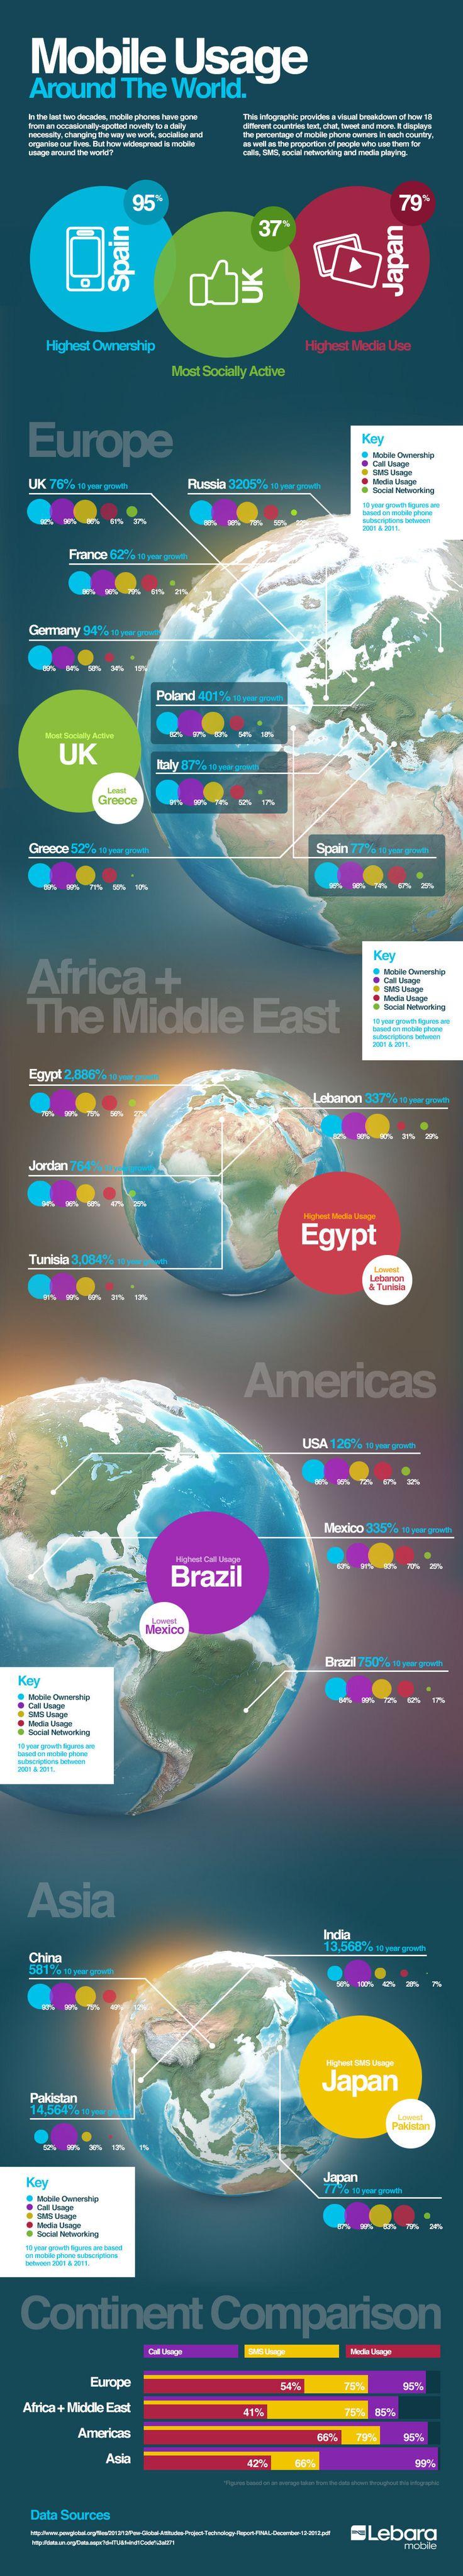 Mobile marketing infographic #ESISsrl #MobileMarketing #WebMarketing